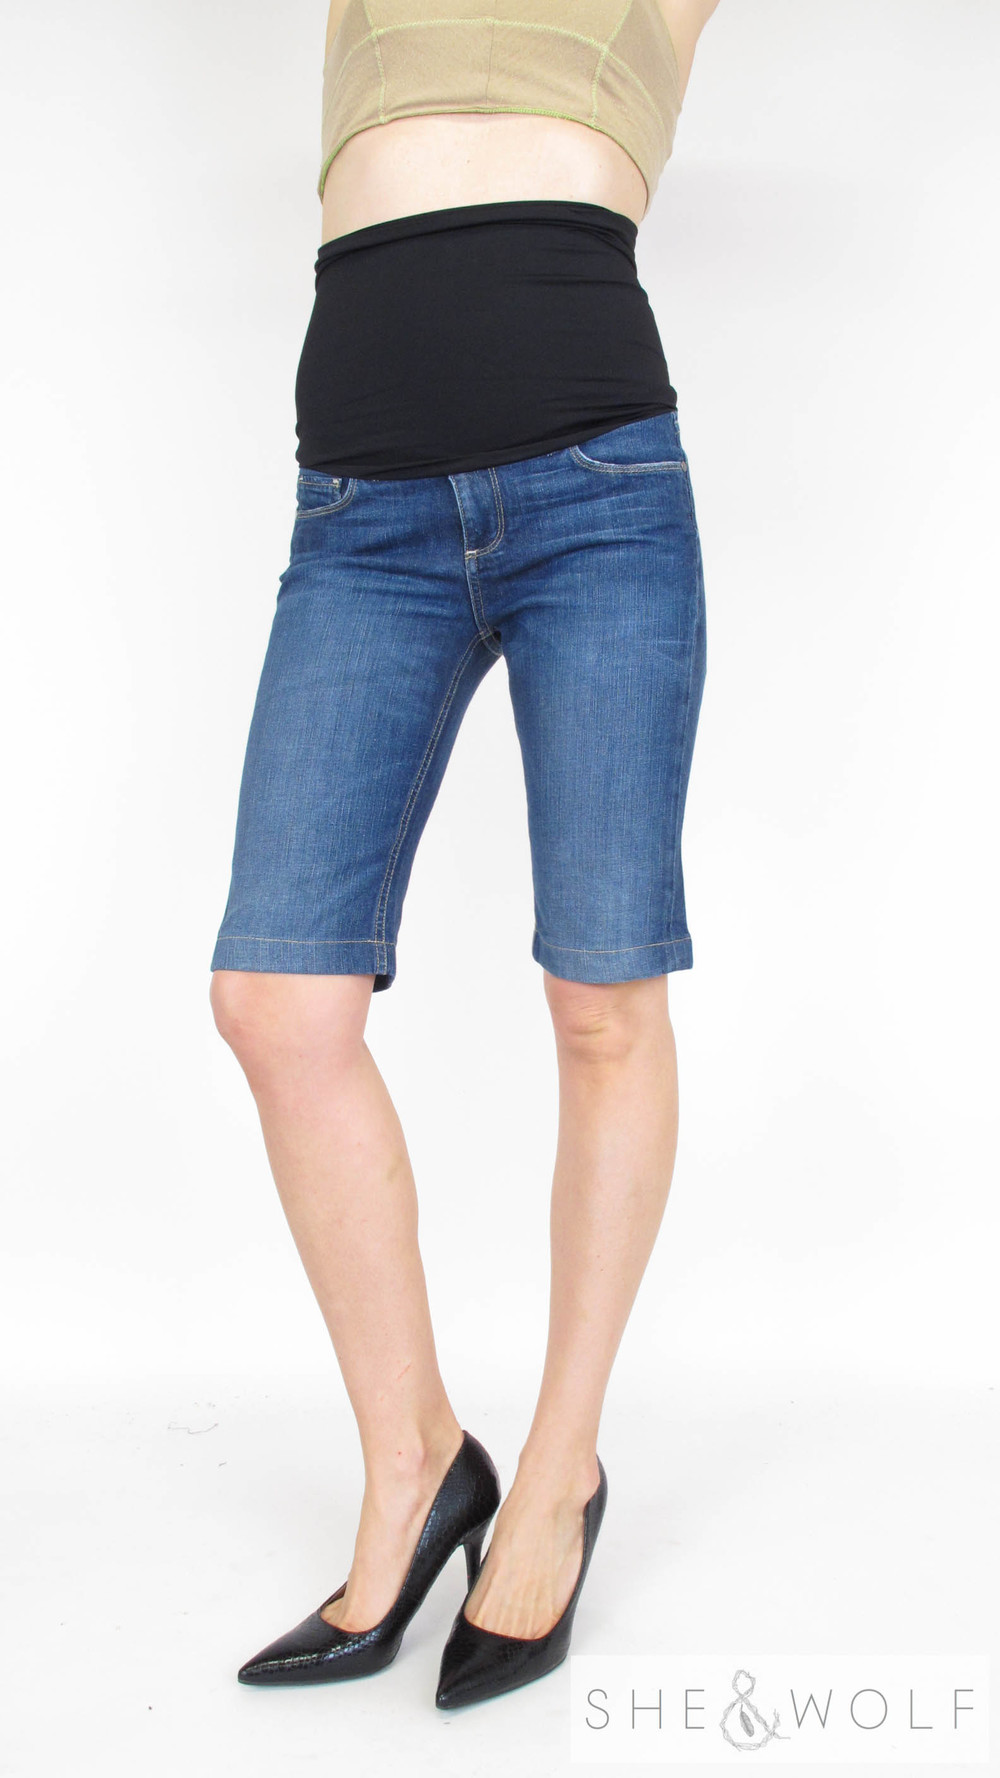 Paige Premium Denim Maternity Jean Shorts 29 She Wolf